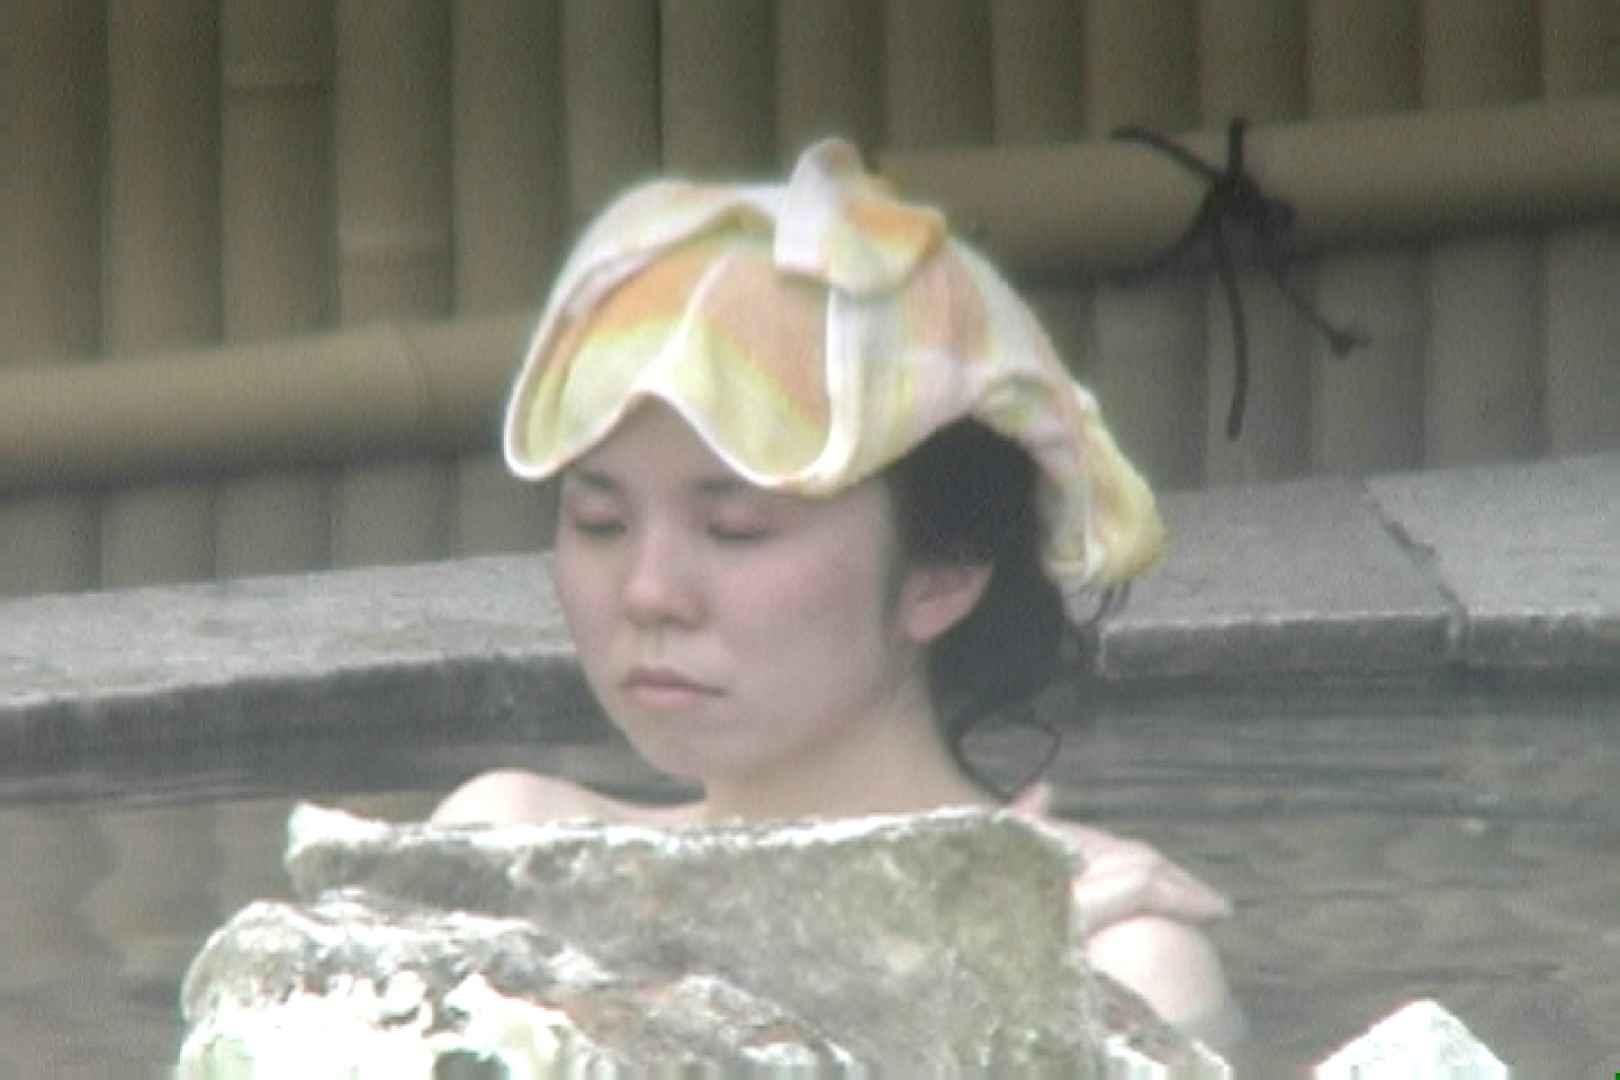 Aquaな露天風呂Vol.687 盗撮   OLセックス  63画像 46